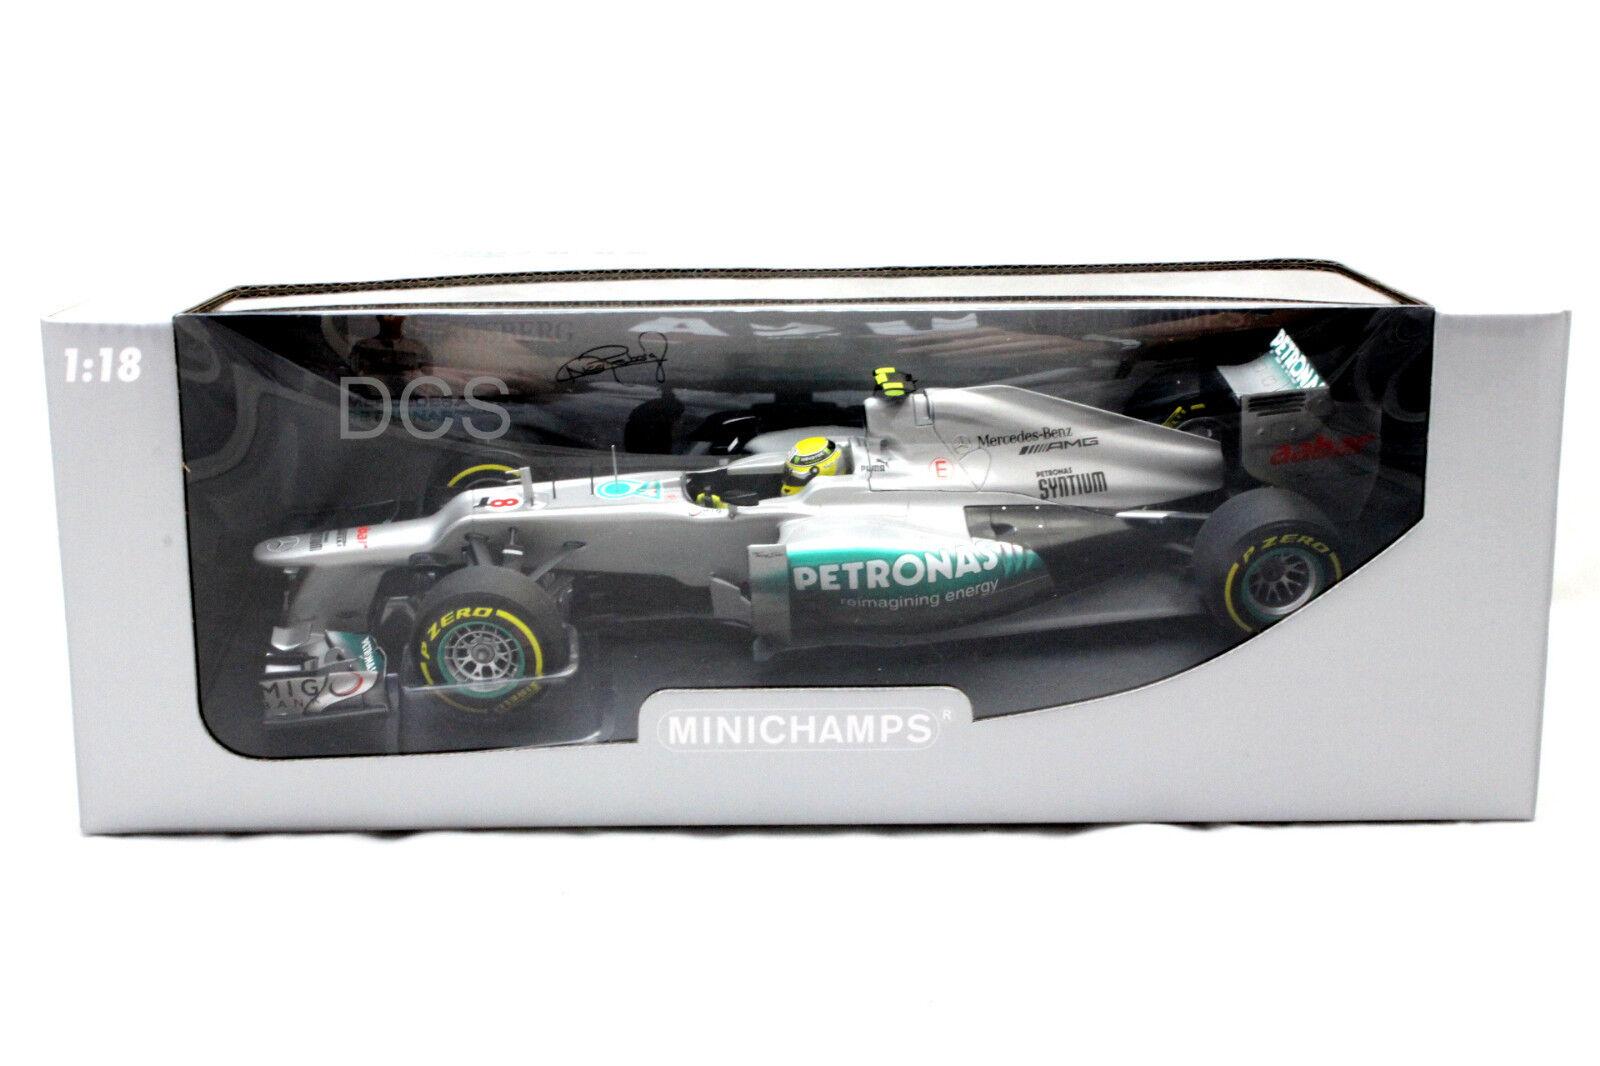 Minichamps F1 W03 Mercedes Amg Petronas 2012 Nico Rosberg 1 18 Diecast